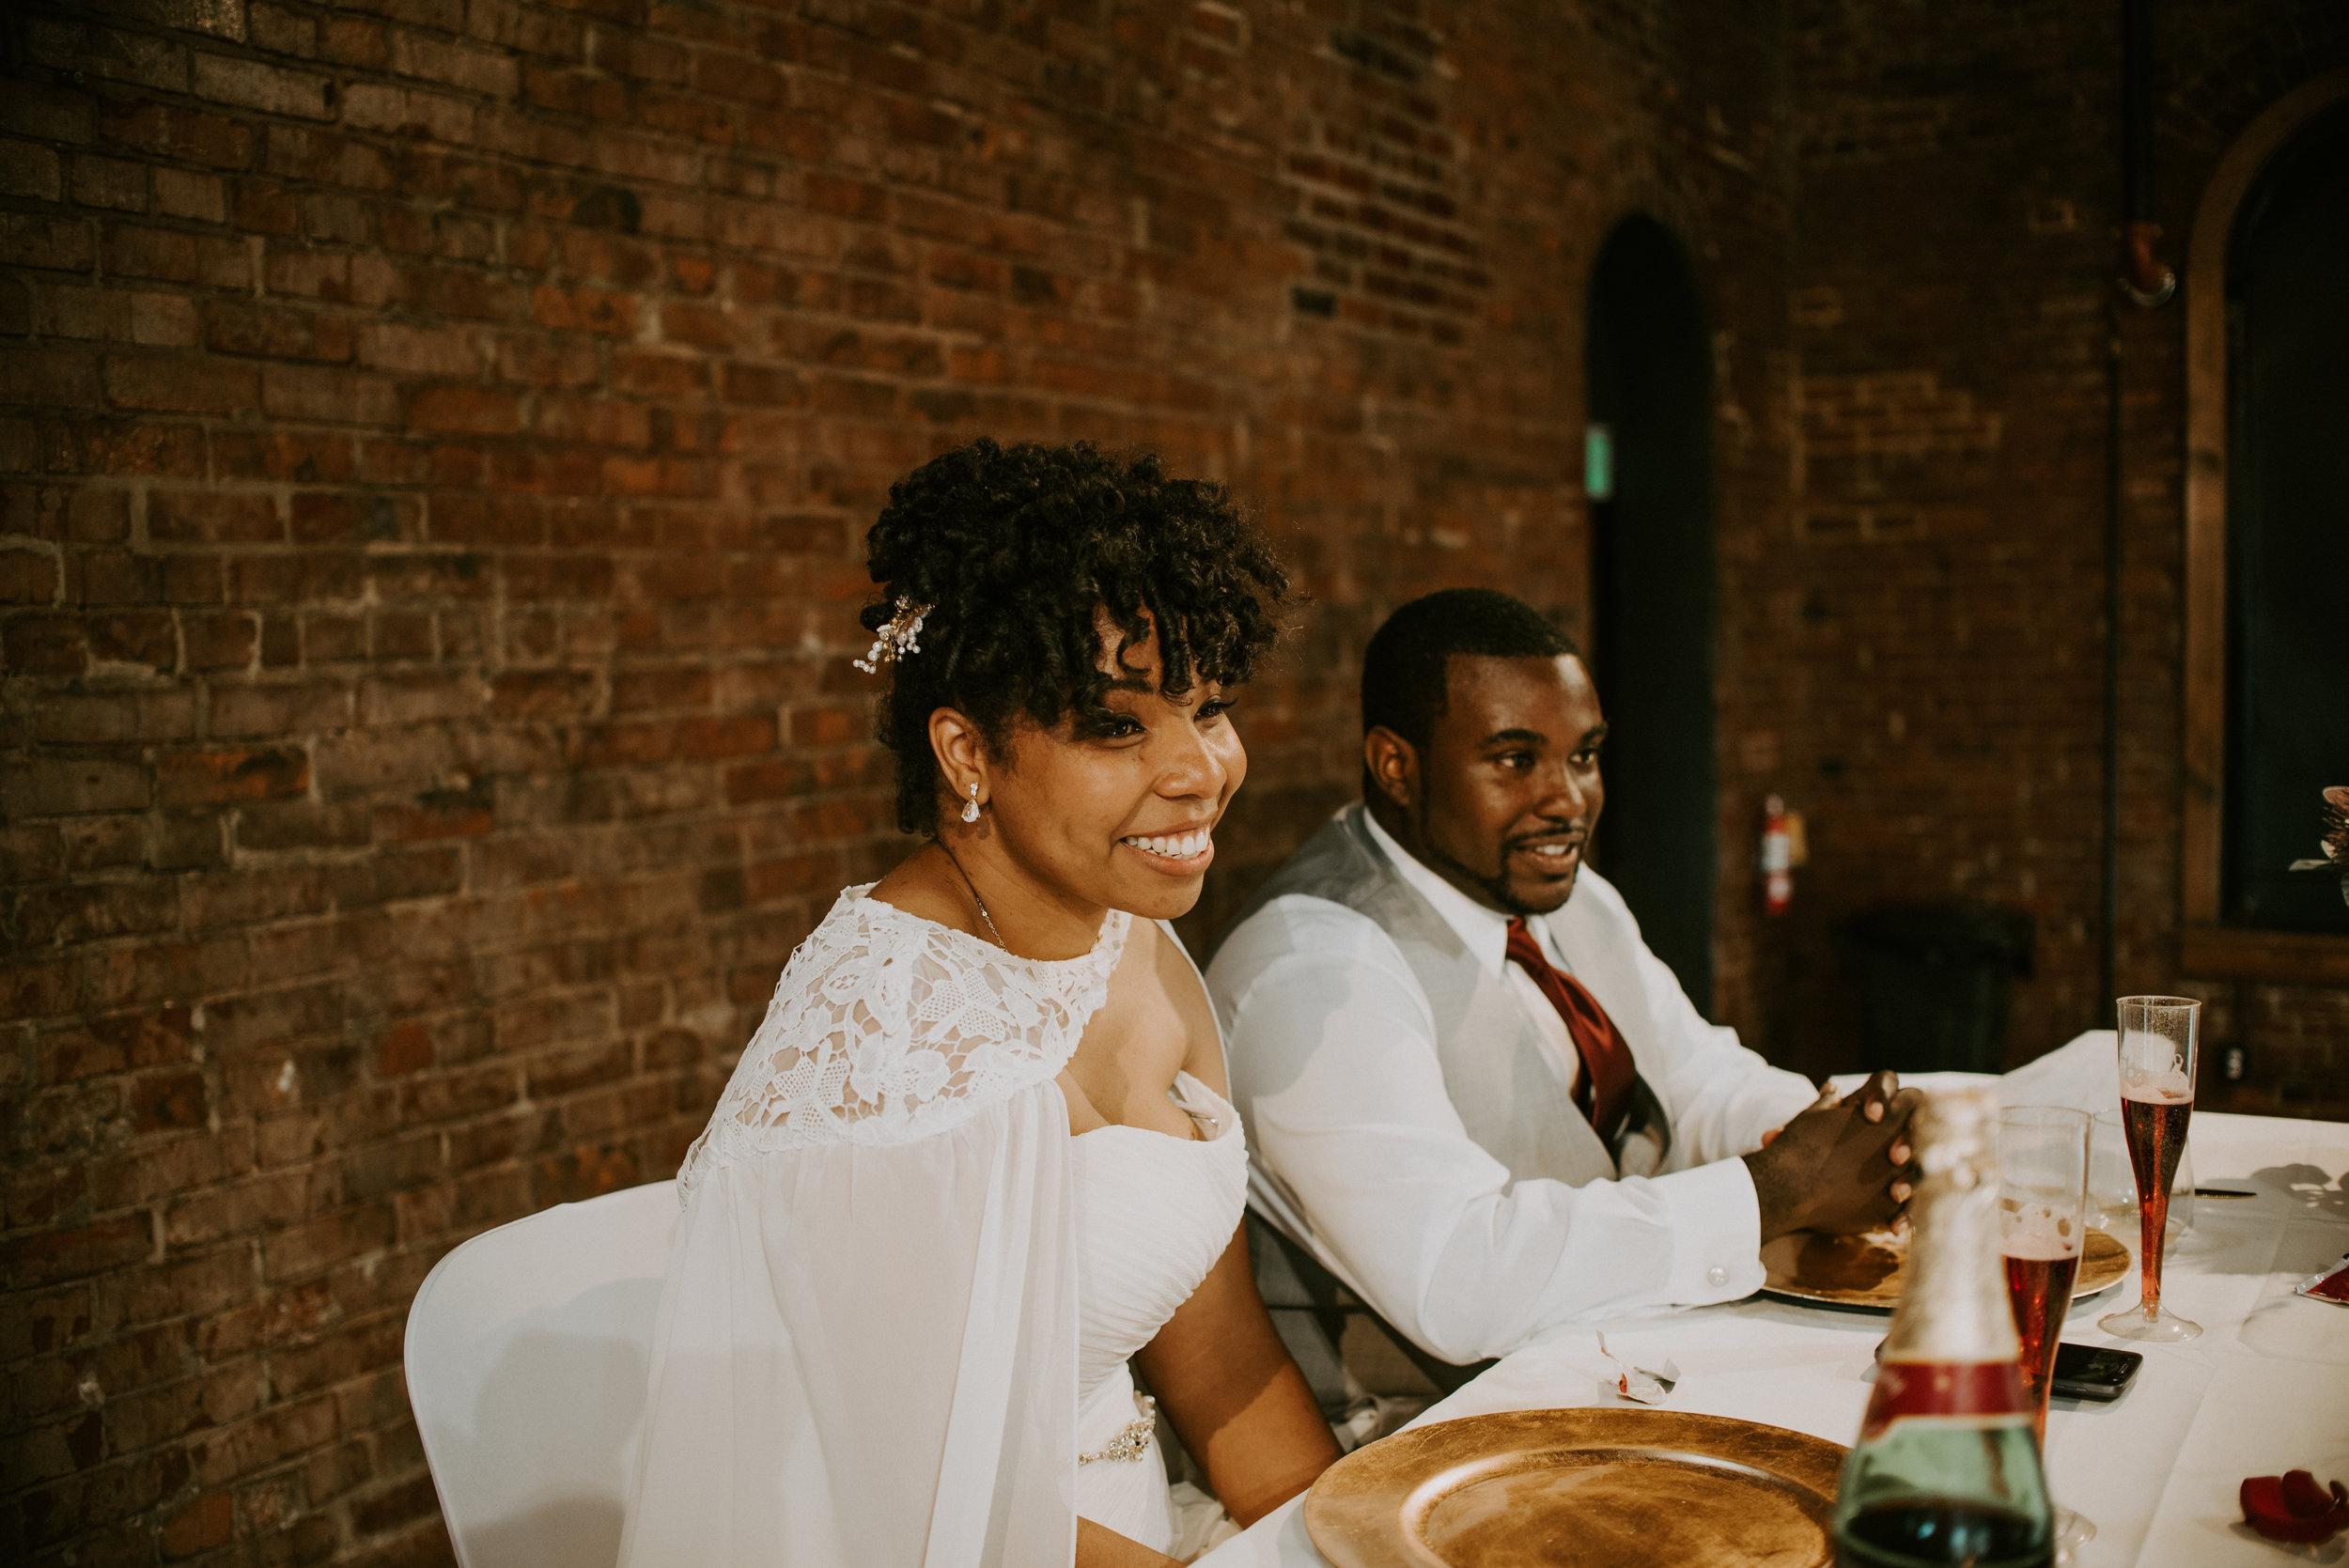 WonderlyCreative_Wedding_6.7.18_Khara&Dwayne_-854.jpg